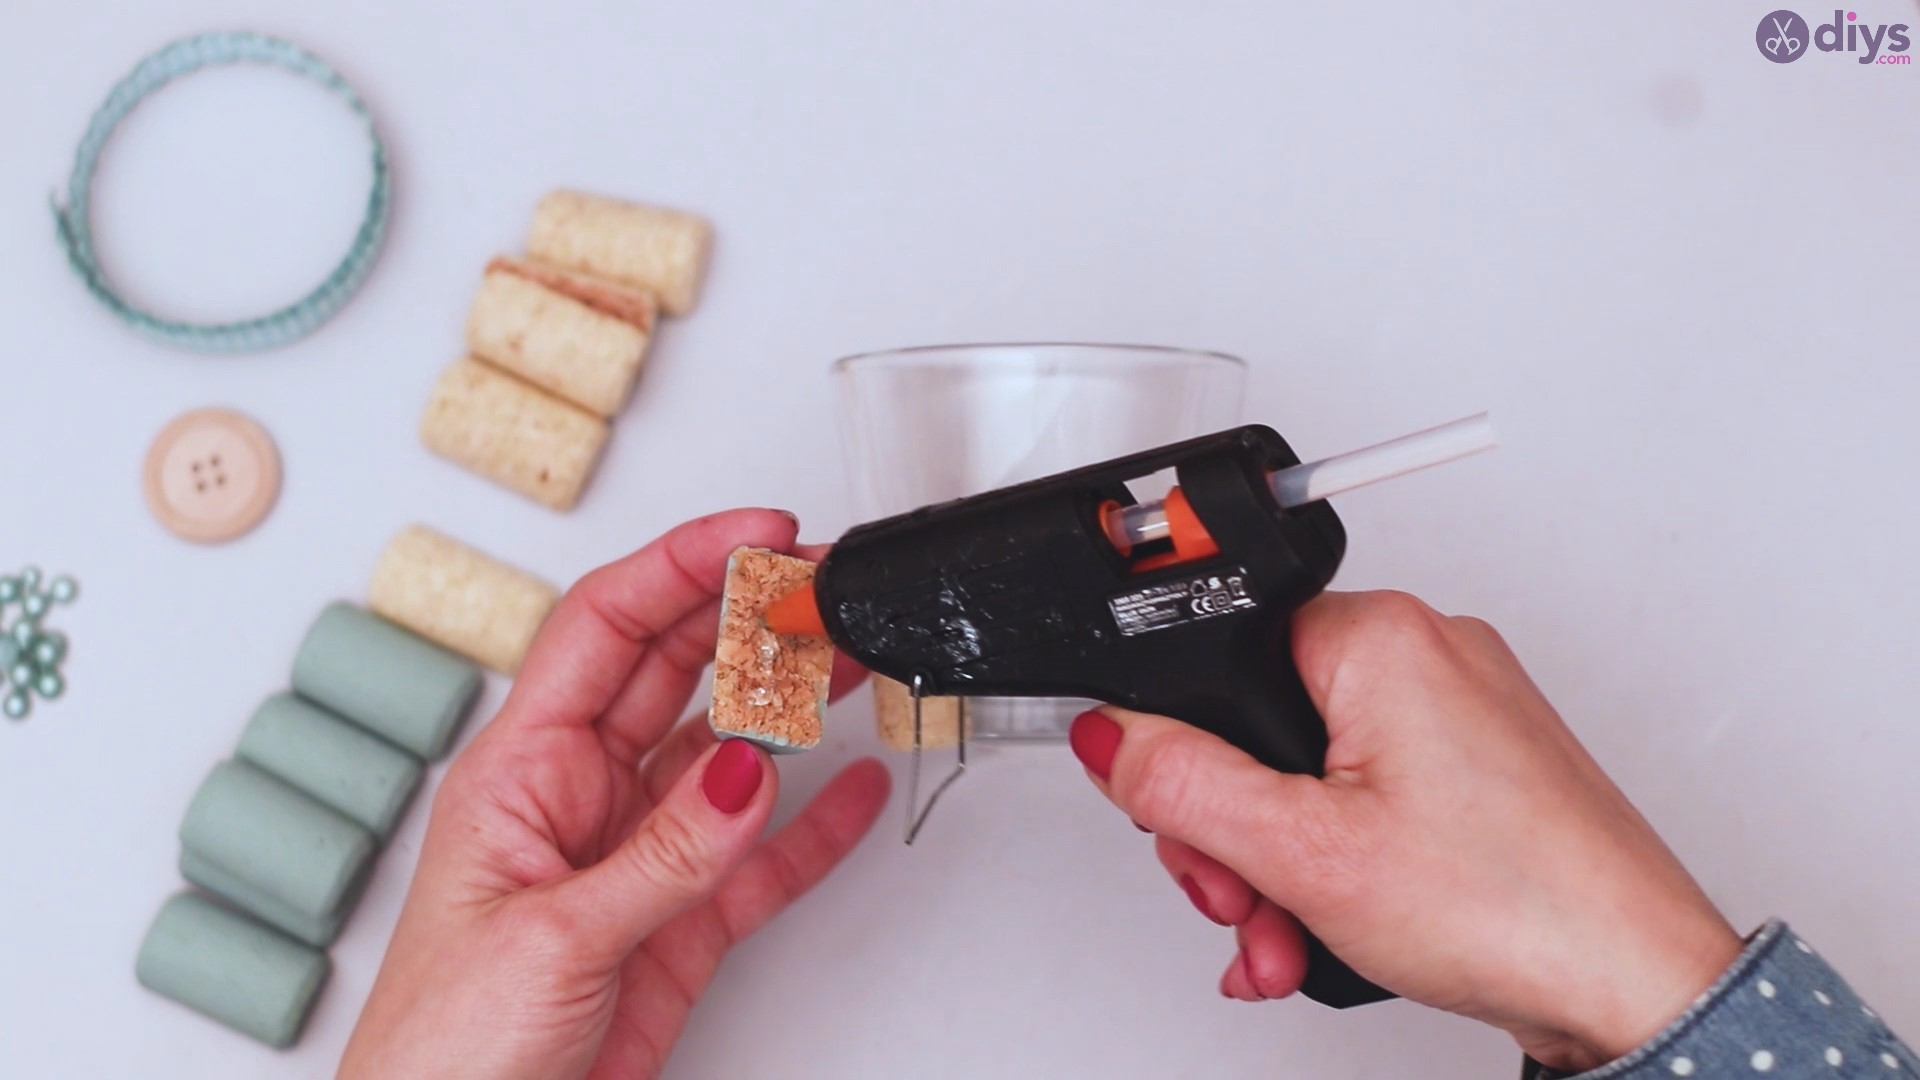 Diy wine cork candle holder (12)